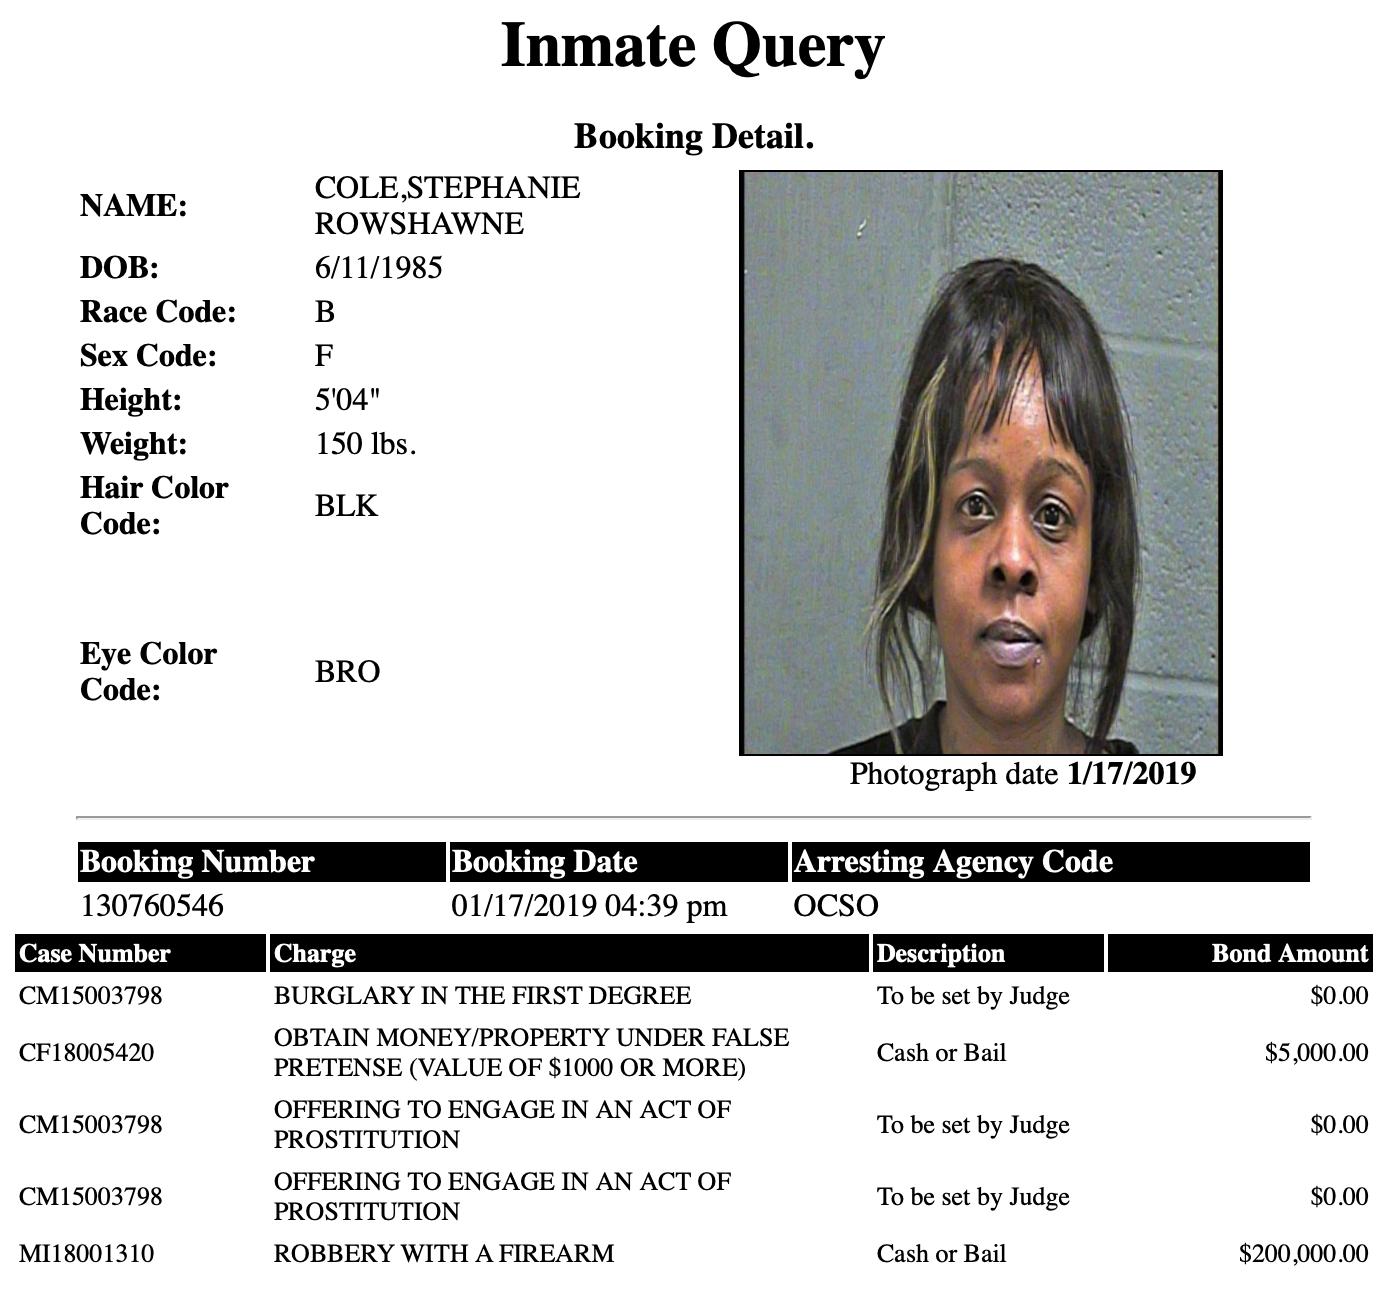 Cole Stephanie Rowshawne Mugshot Prostitute 2019-01-17.png